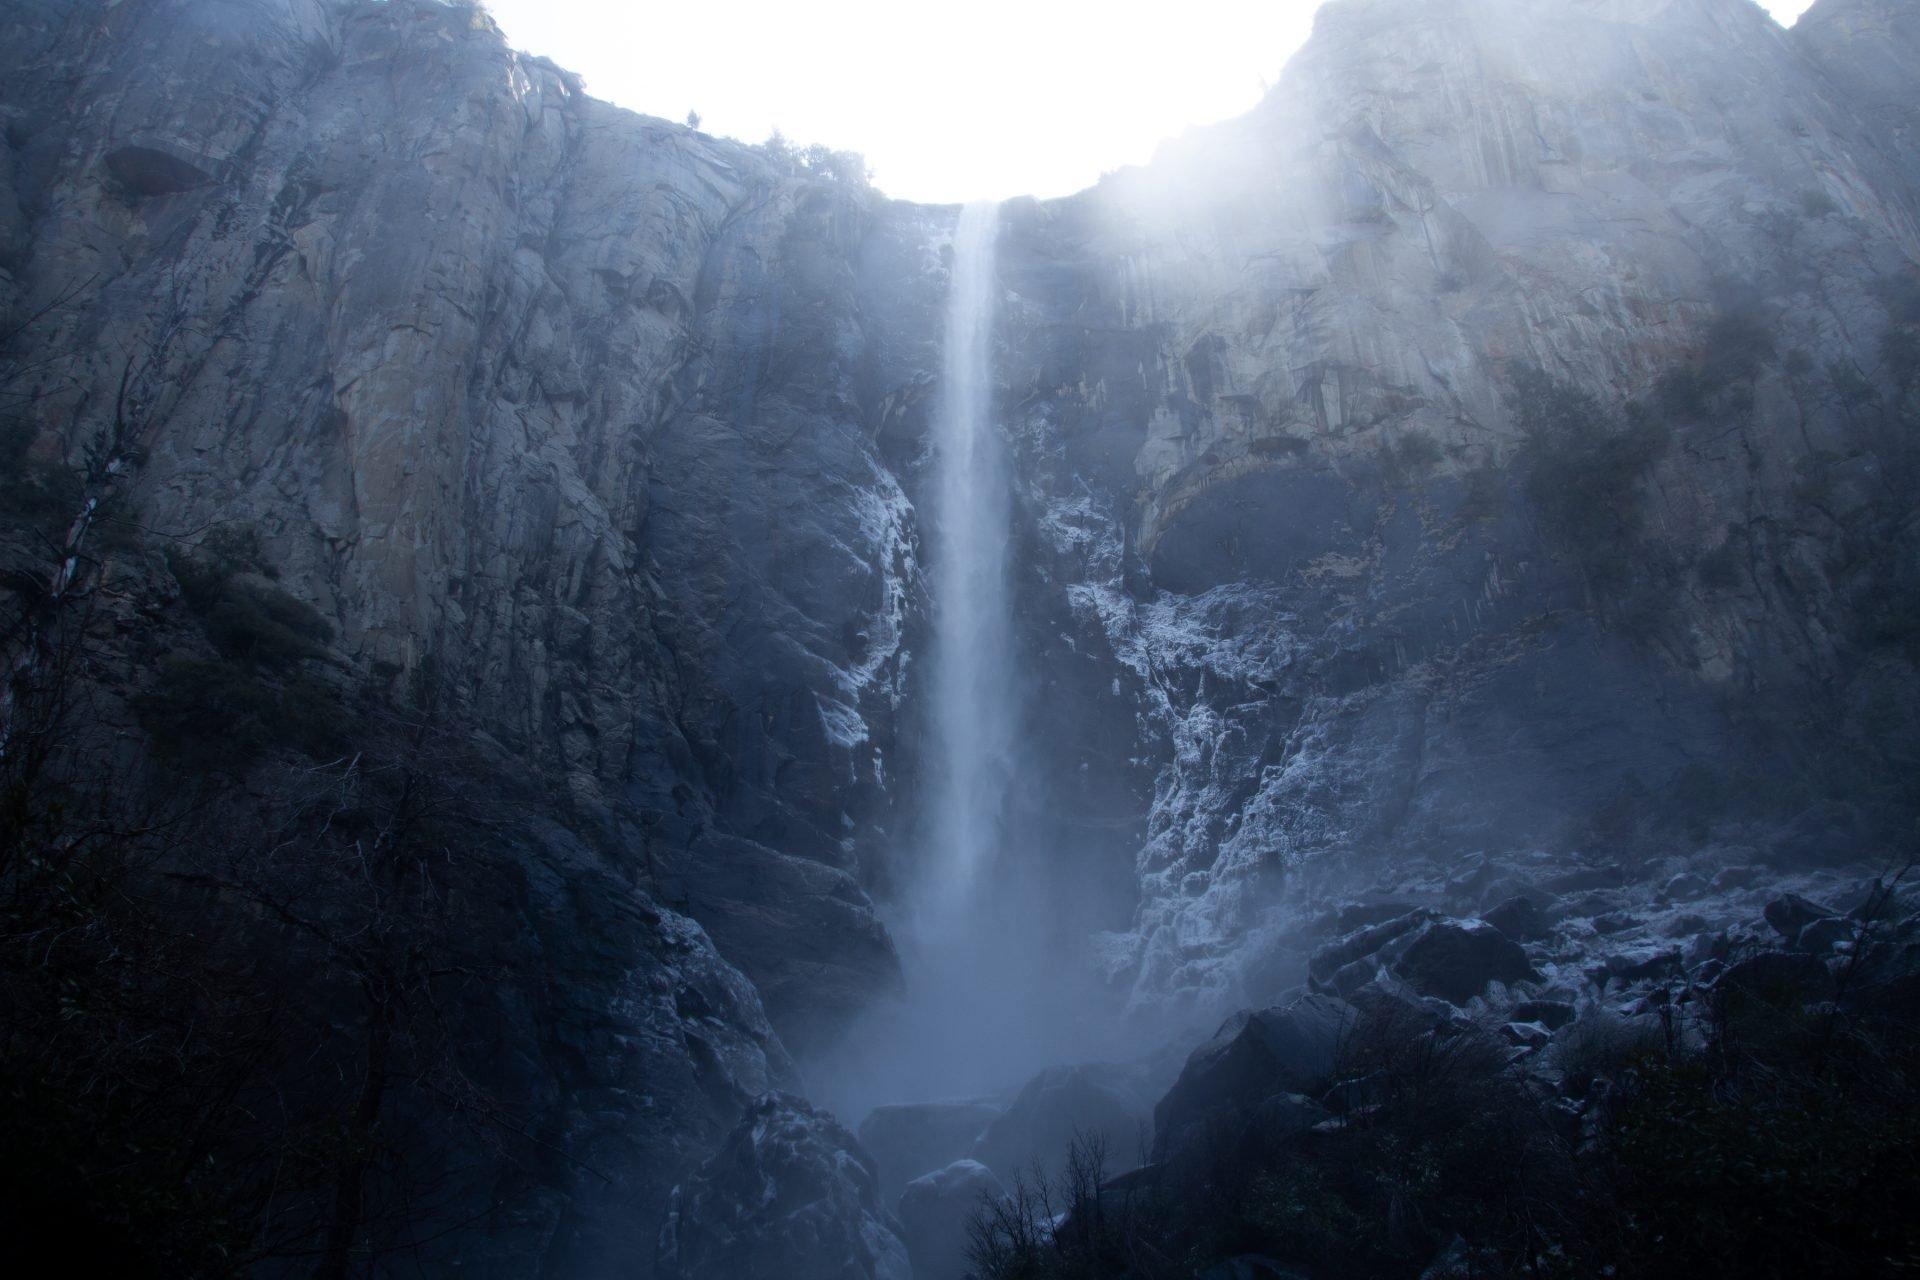 Long Waterfall Streaming Down Rock Cliff